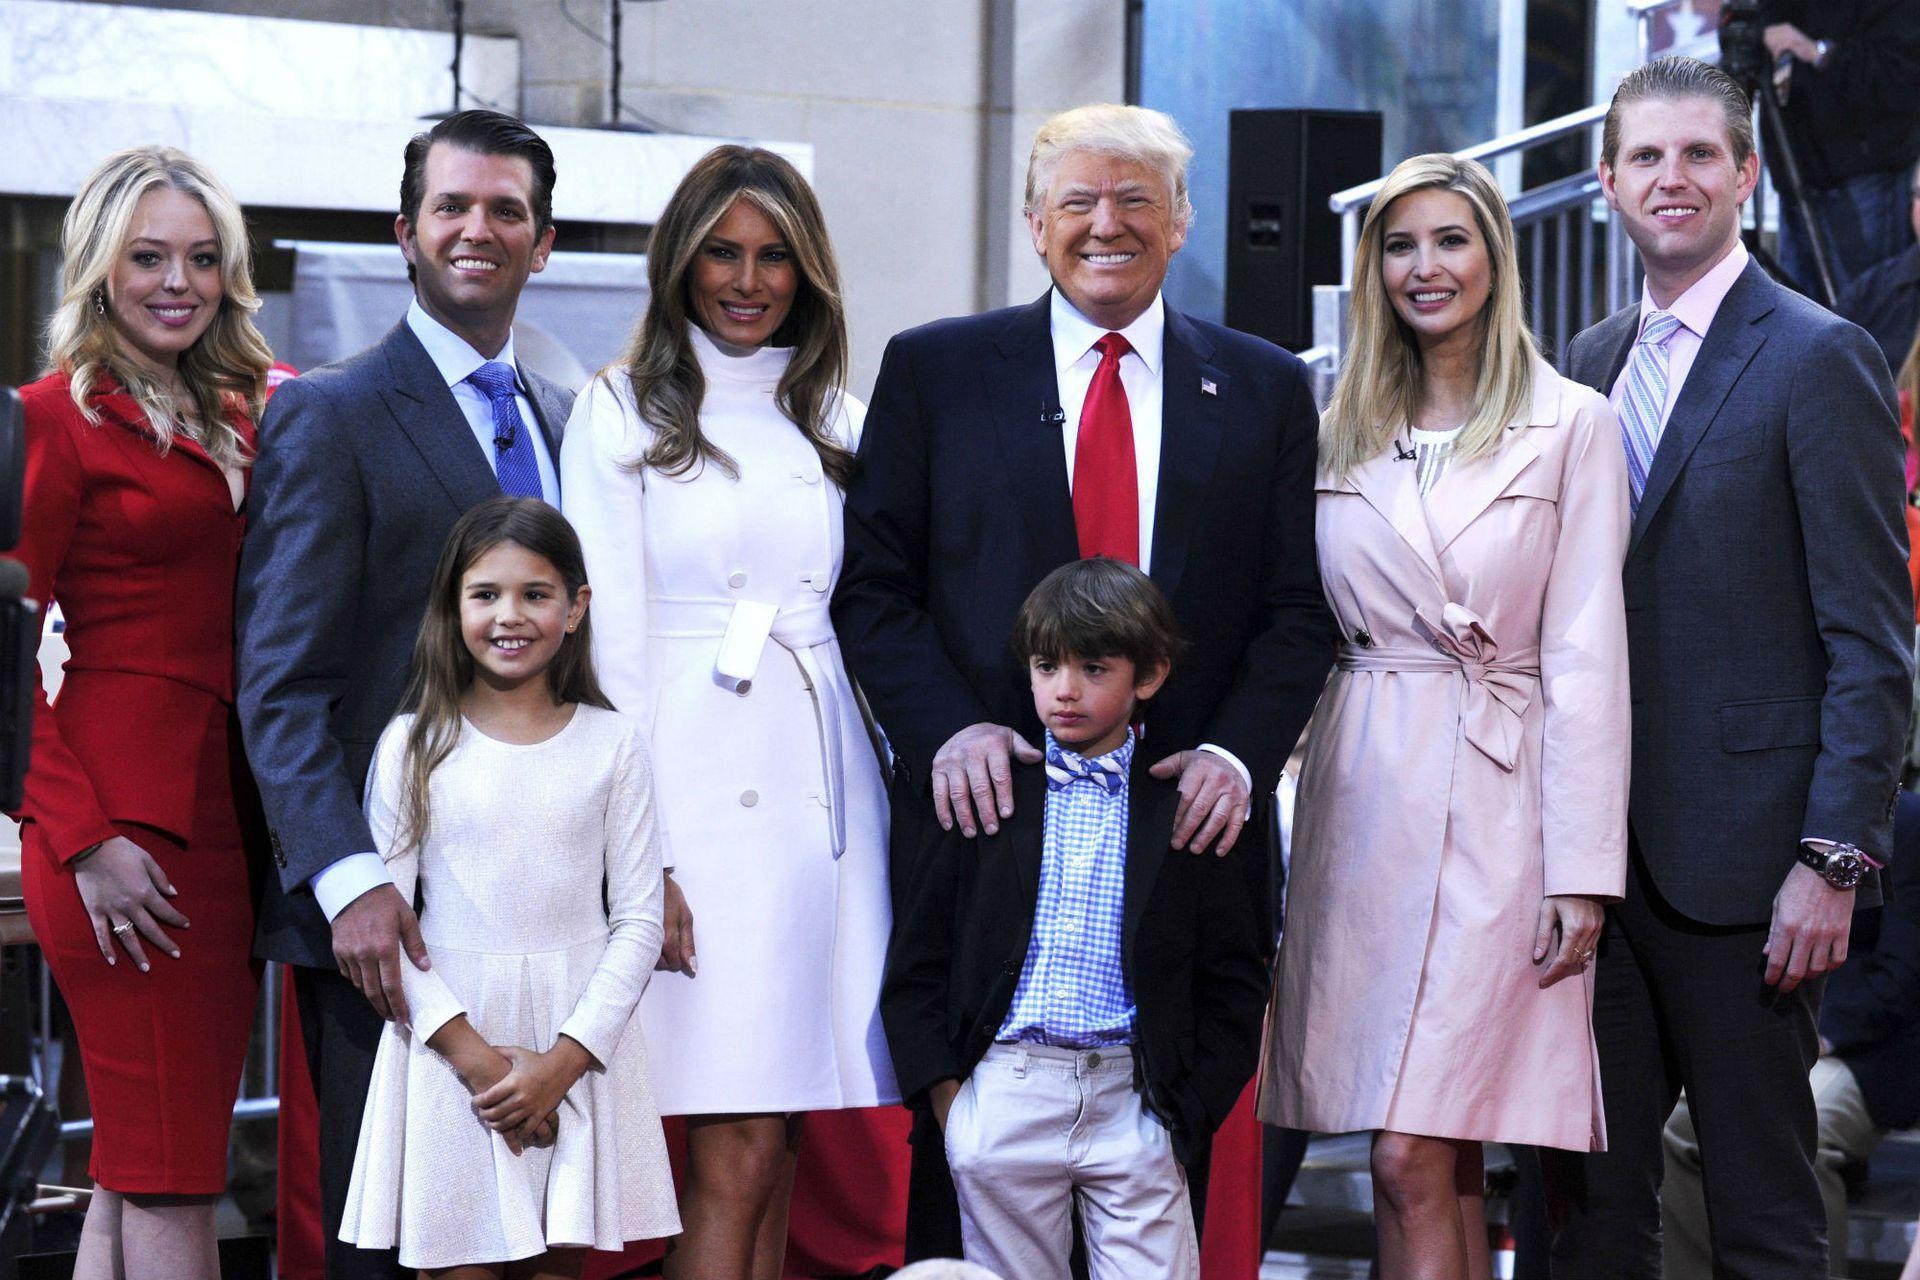 La familia Trump completa, en 2016